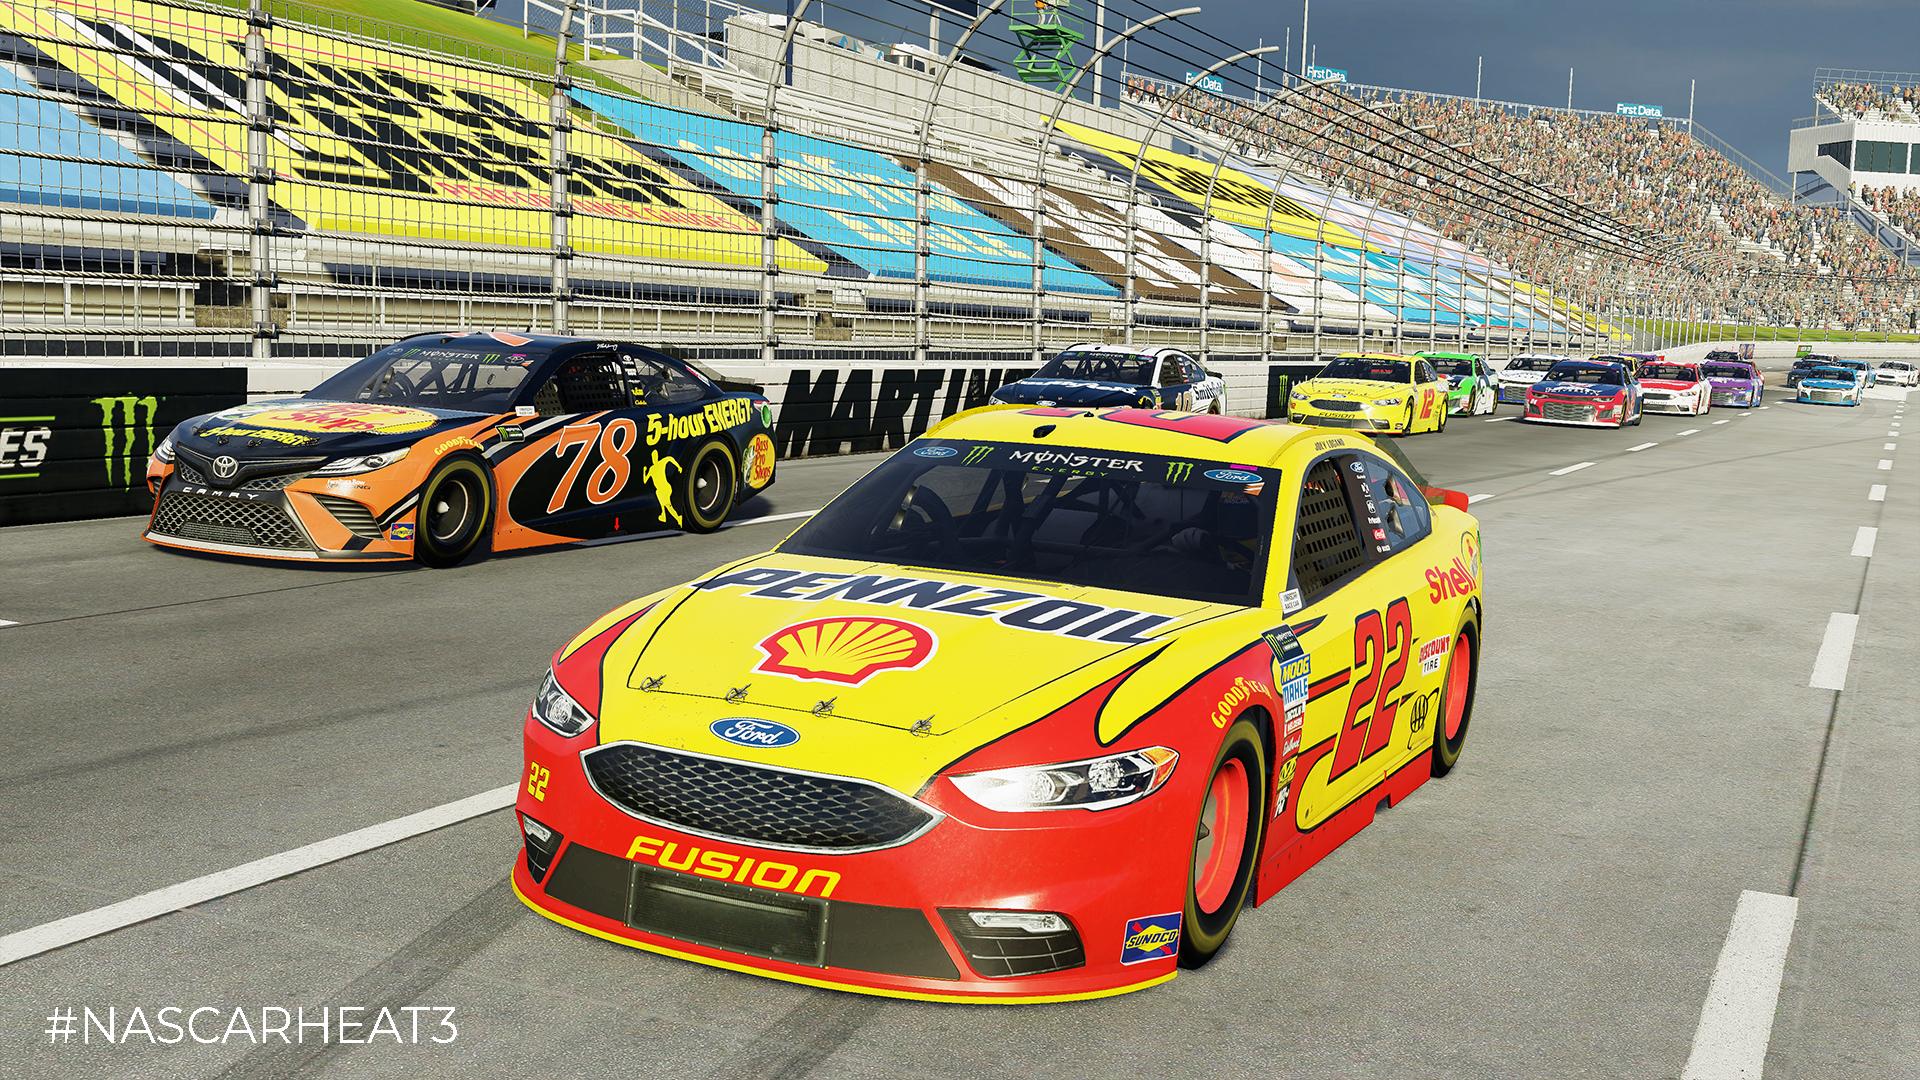 nascar ticket voucher, nascar heat, 704 games, nascar, racing video game